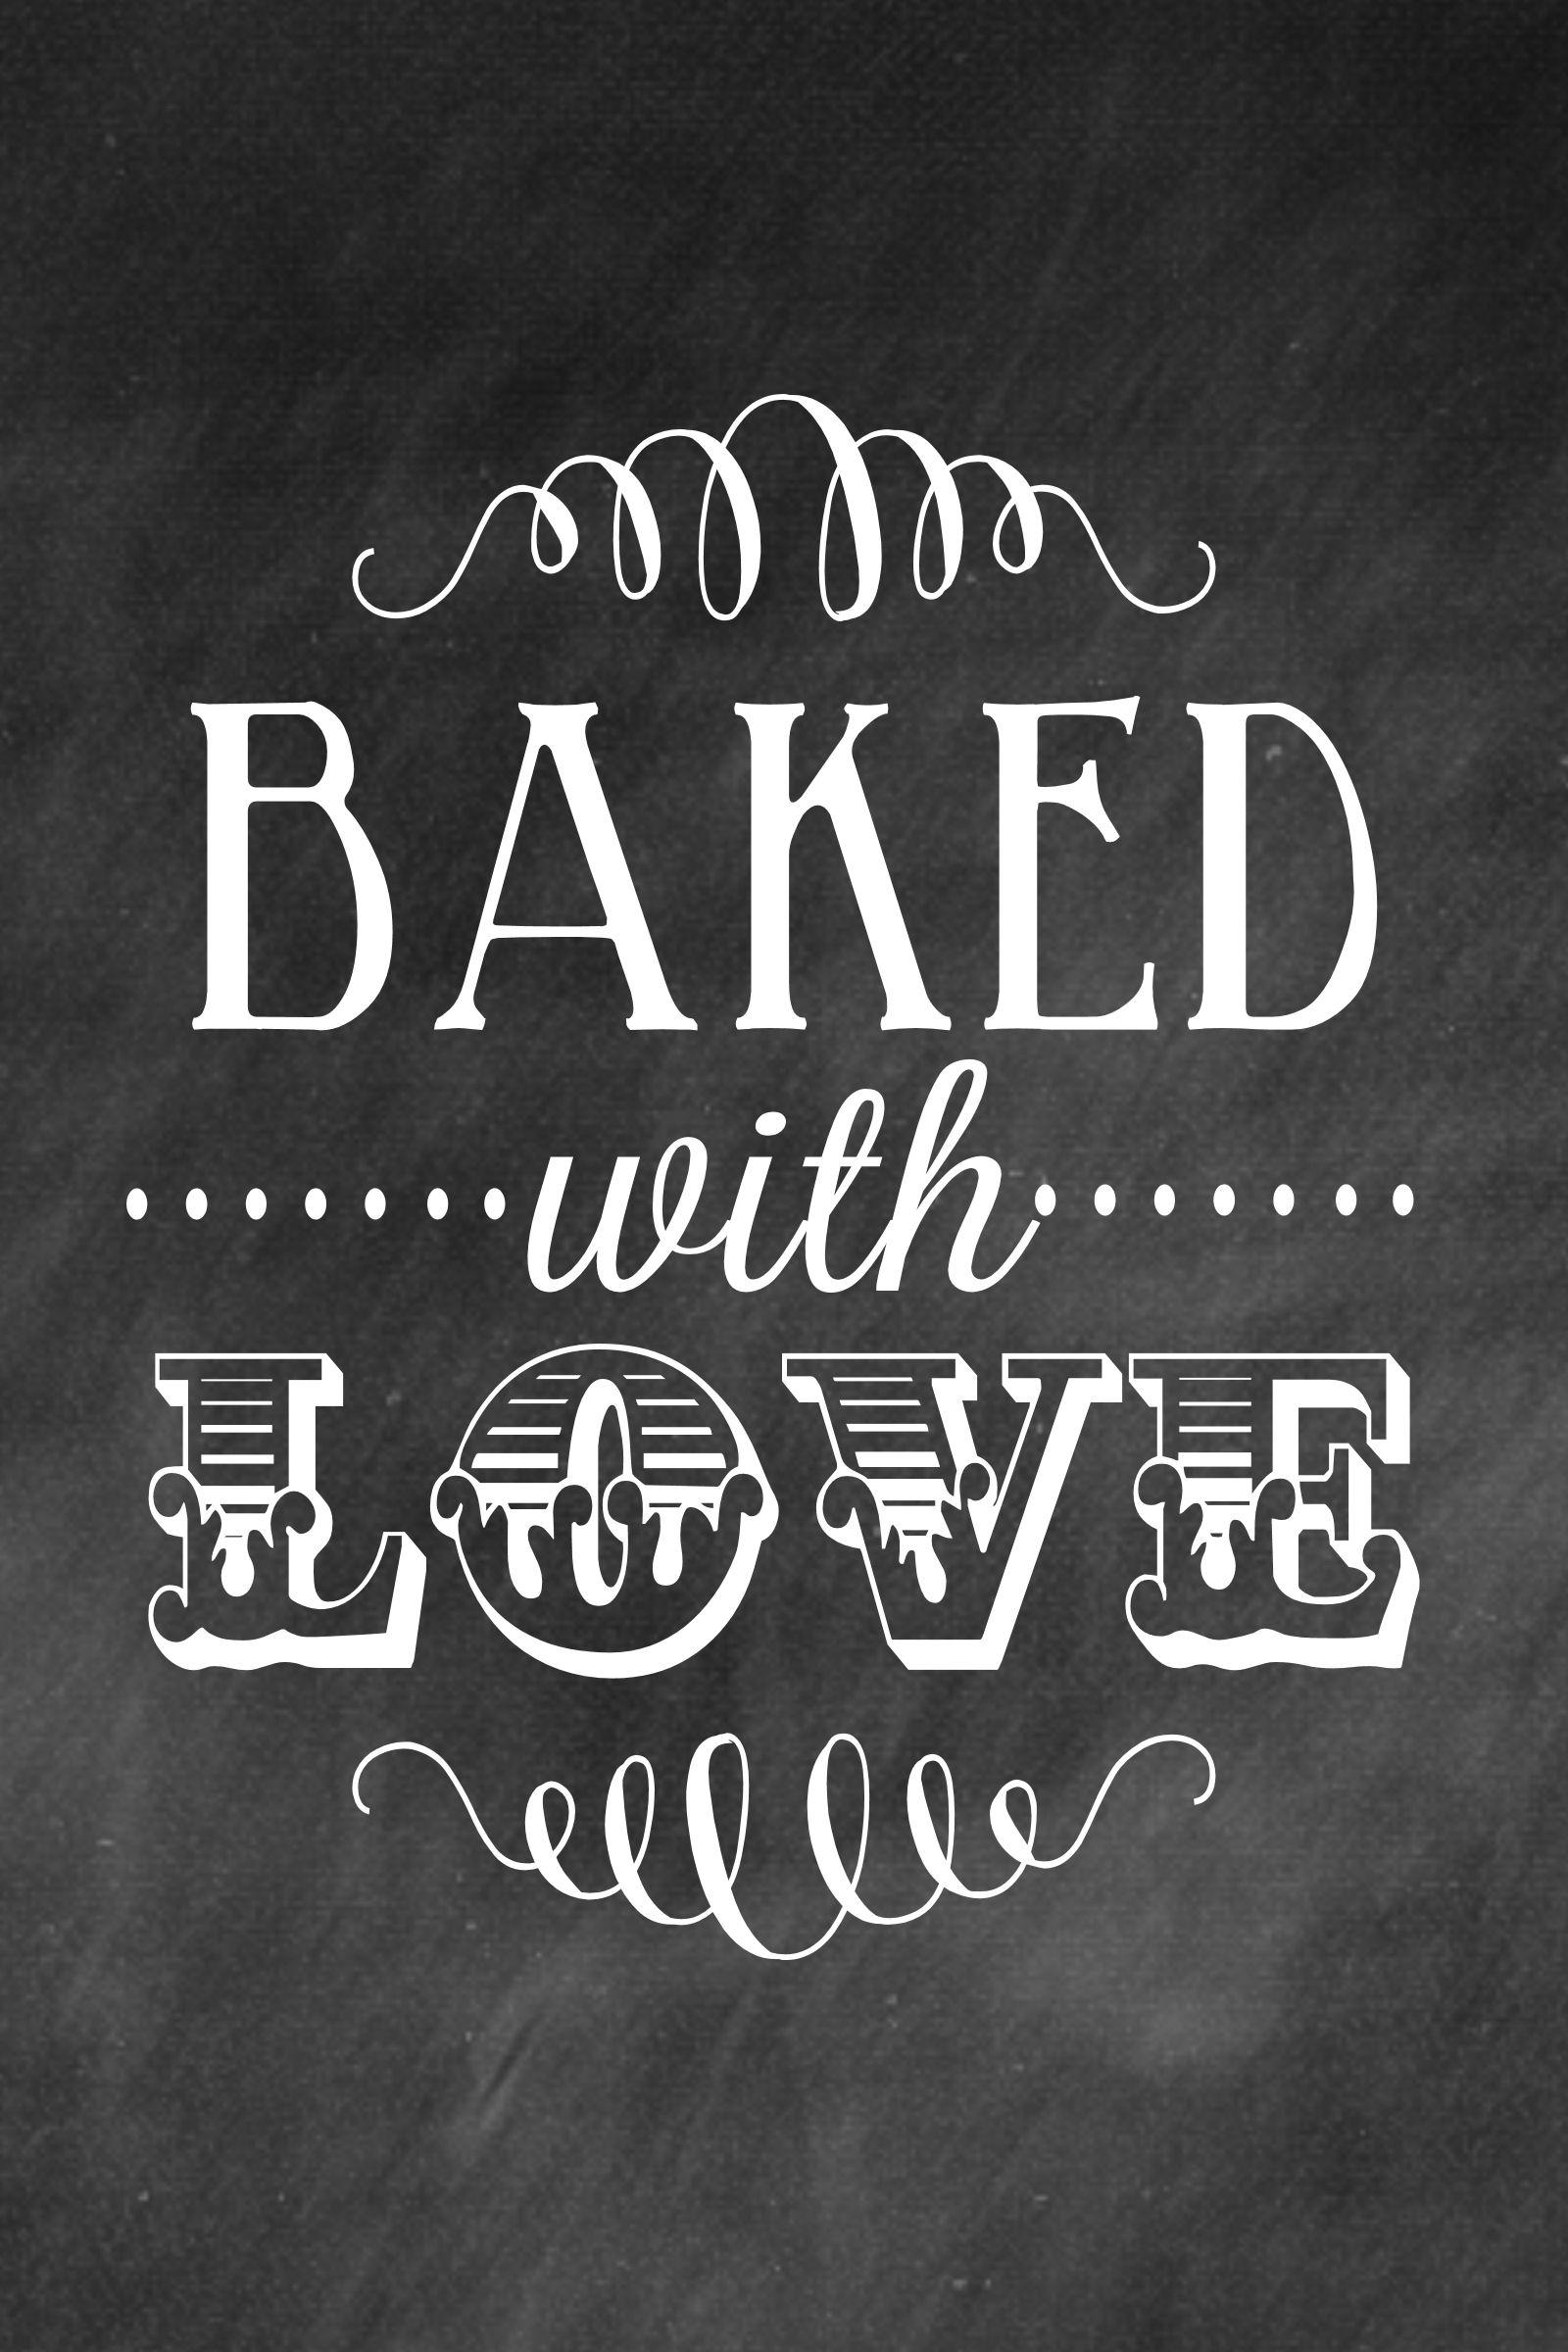 Christmas Baking Quotes : christmas, baking, quotes, Quotes, About, Christmas, Baking, Quotes)